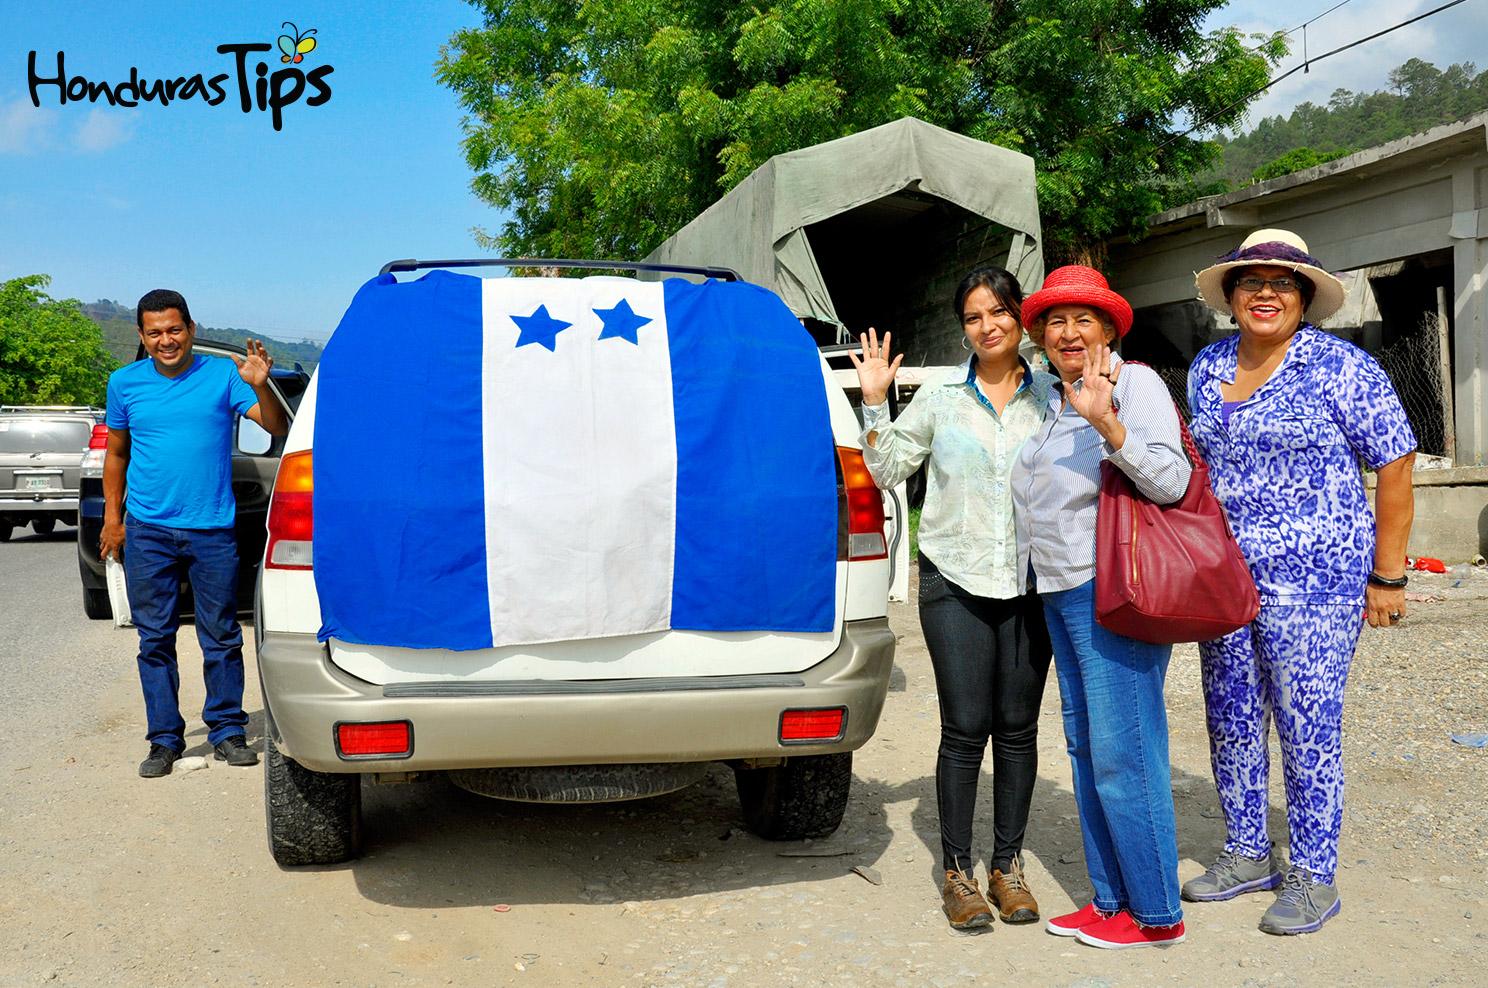 Esta familia plasmó su amor por Honduras con esta bandera de gran tamaño.